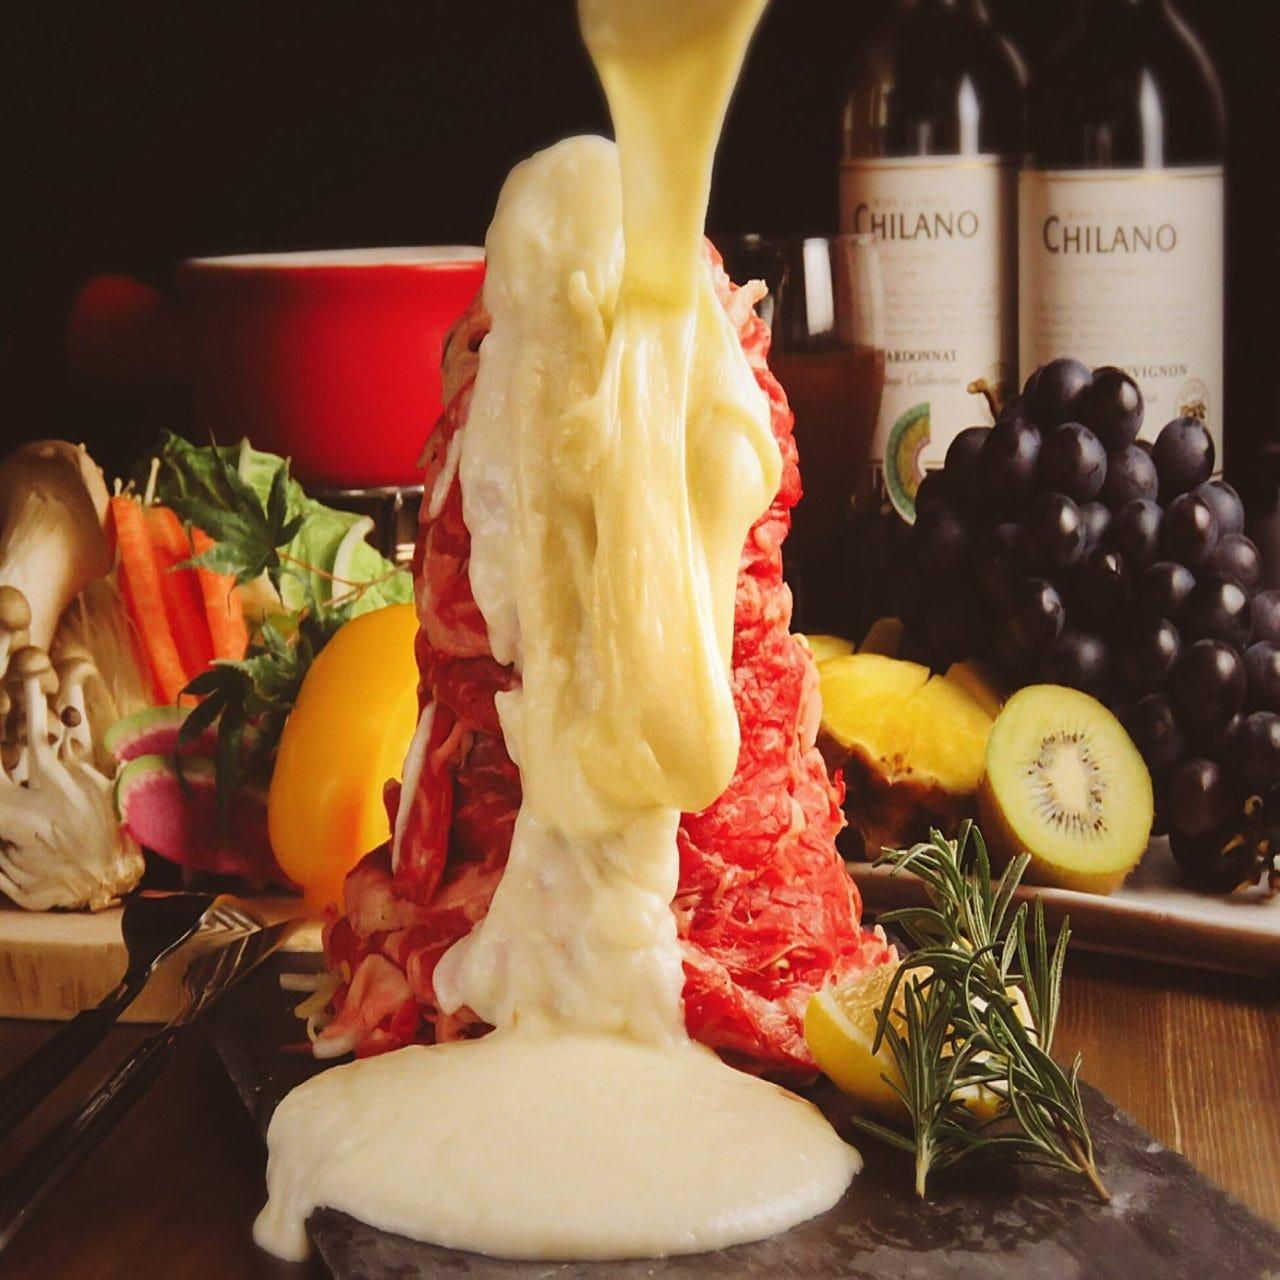 SNSで話題の2019年トレンド『肉炊きWチーズ鍋』が期間限定で登場